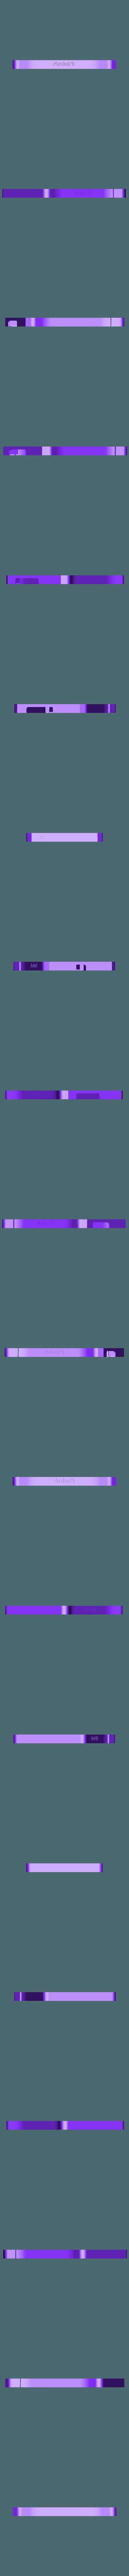 ArduPi Case Rear v1 v30.stl Download STL file Arduino RaspBerry Pi Rasbian On Site Programmer • 3D printer template, nik101968